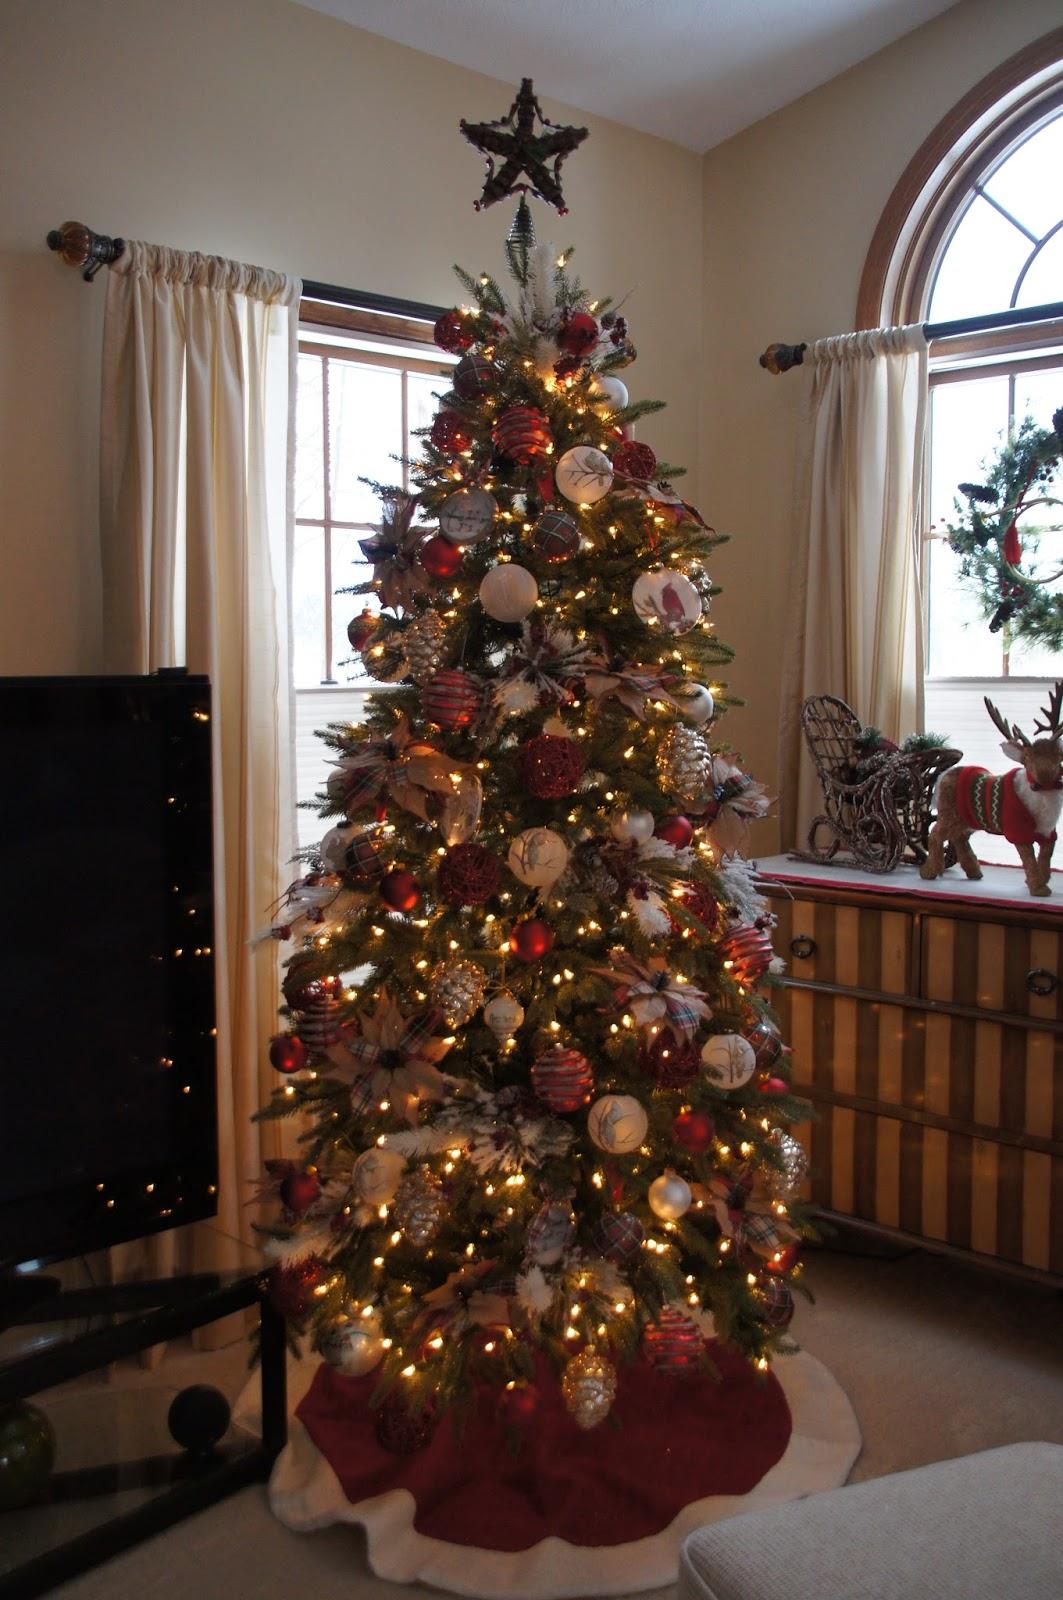 Home and Gardening With Liz: Christmas 2017 Mantel and Living Room